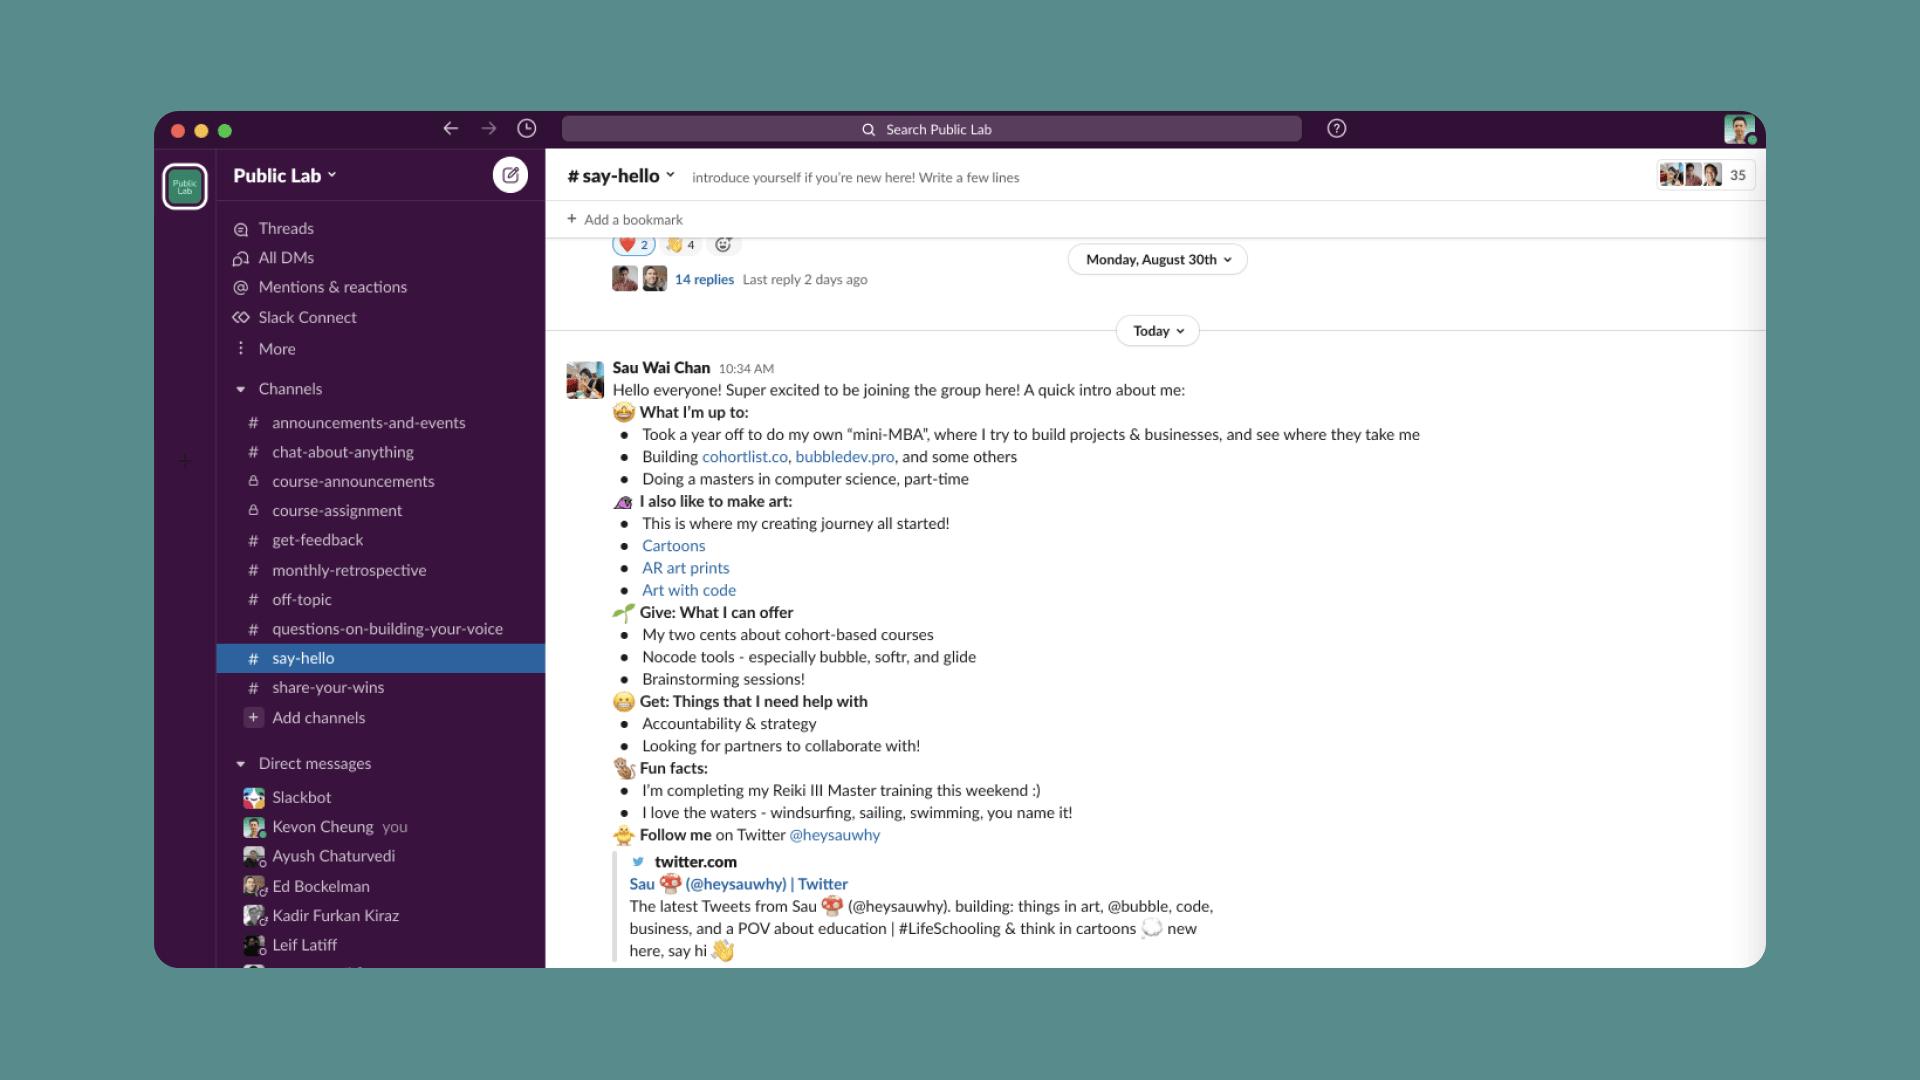 Public Lab is now on Slack